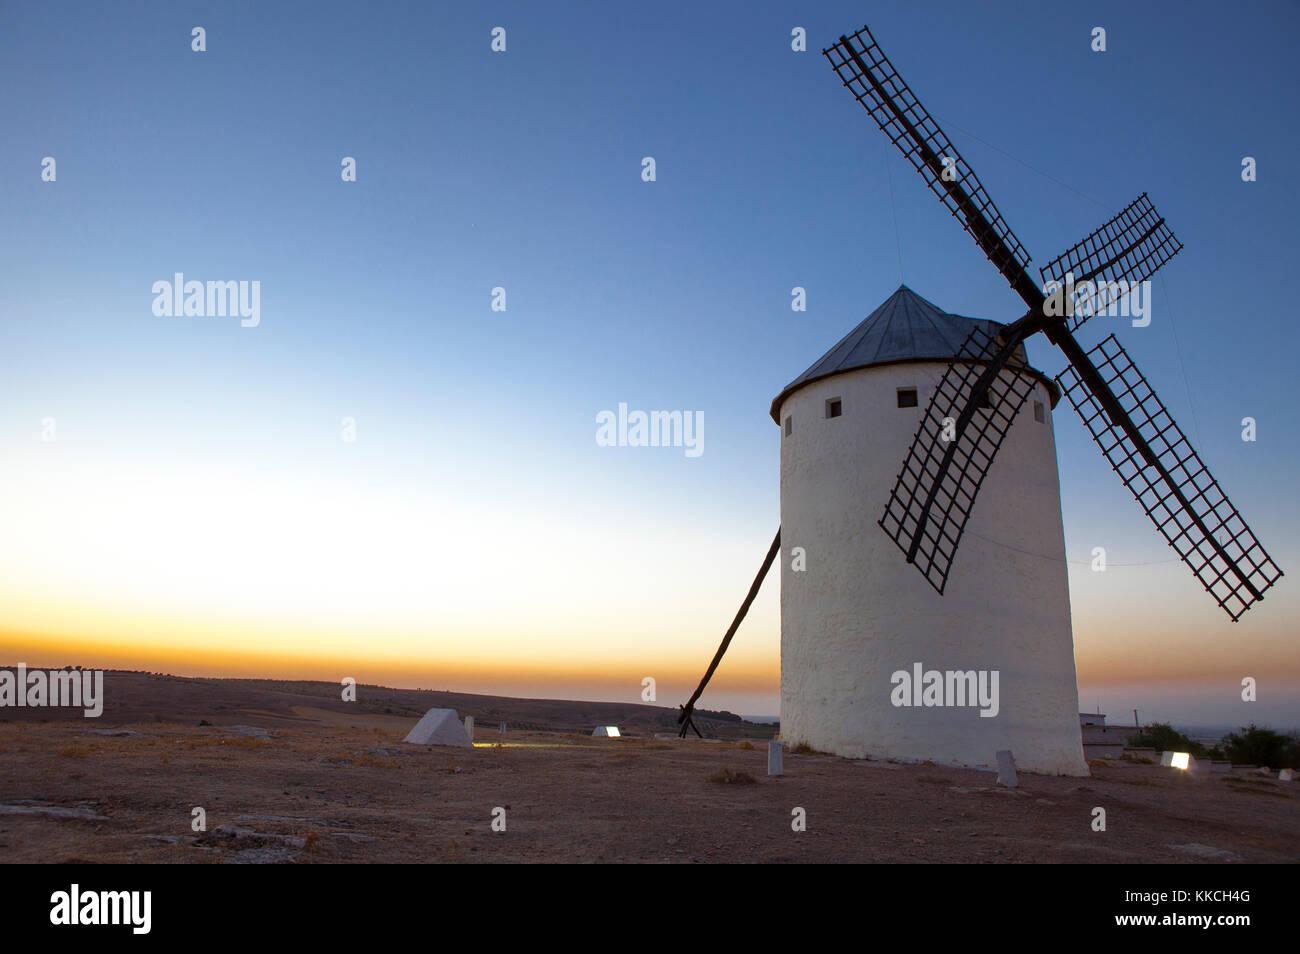 Illuminaed traditional windmill at rising, Campo de Criptana, Spain - Stock Image